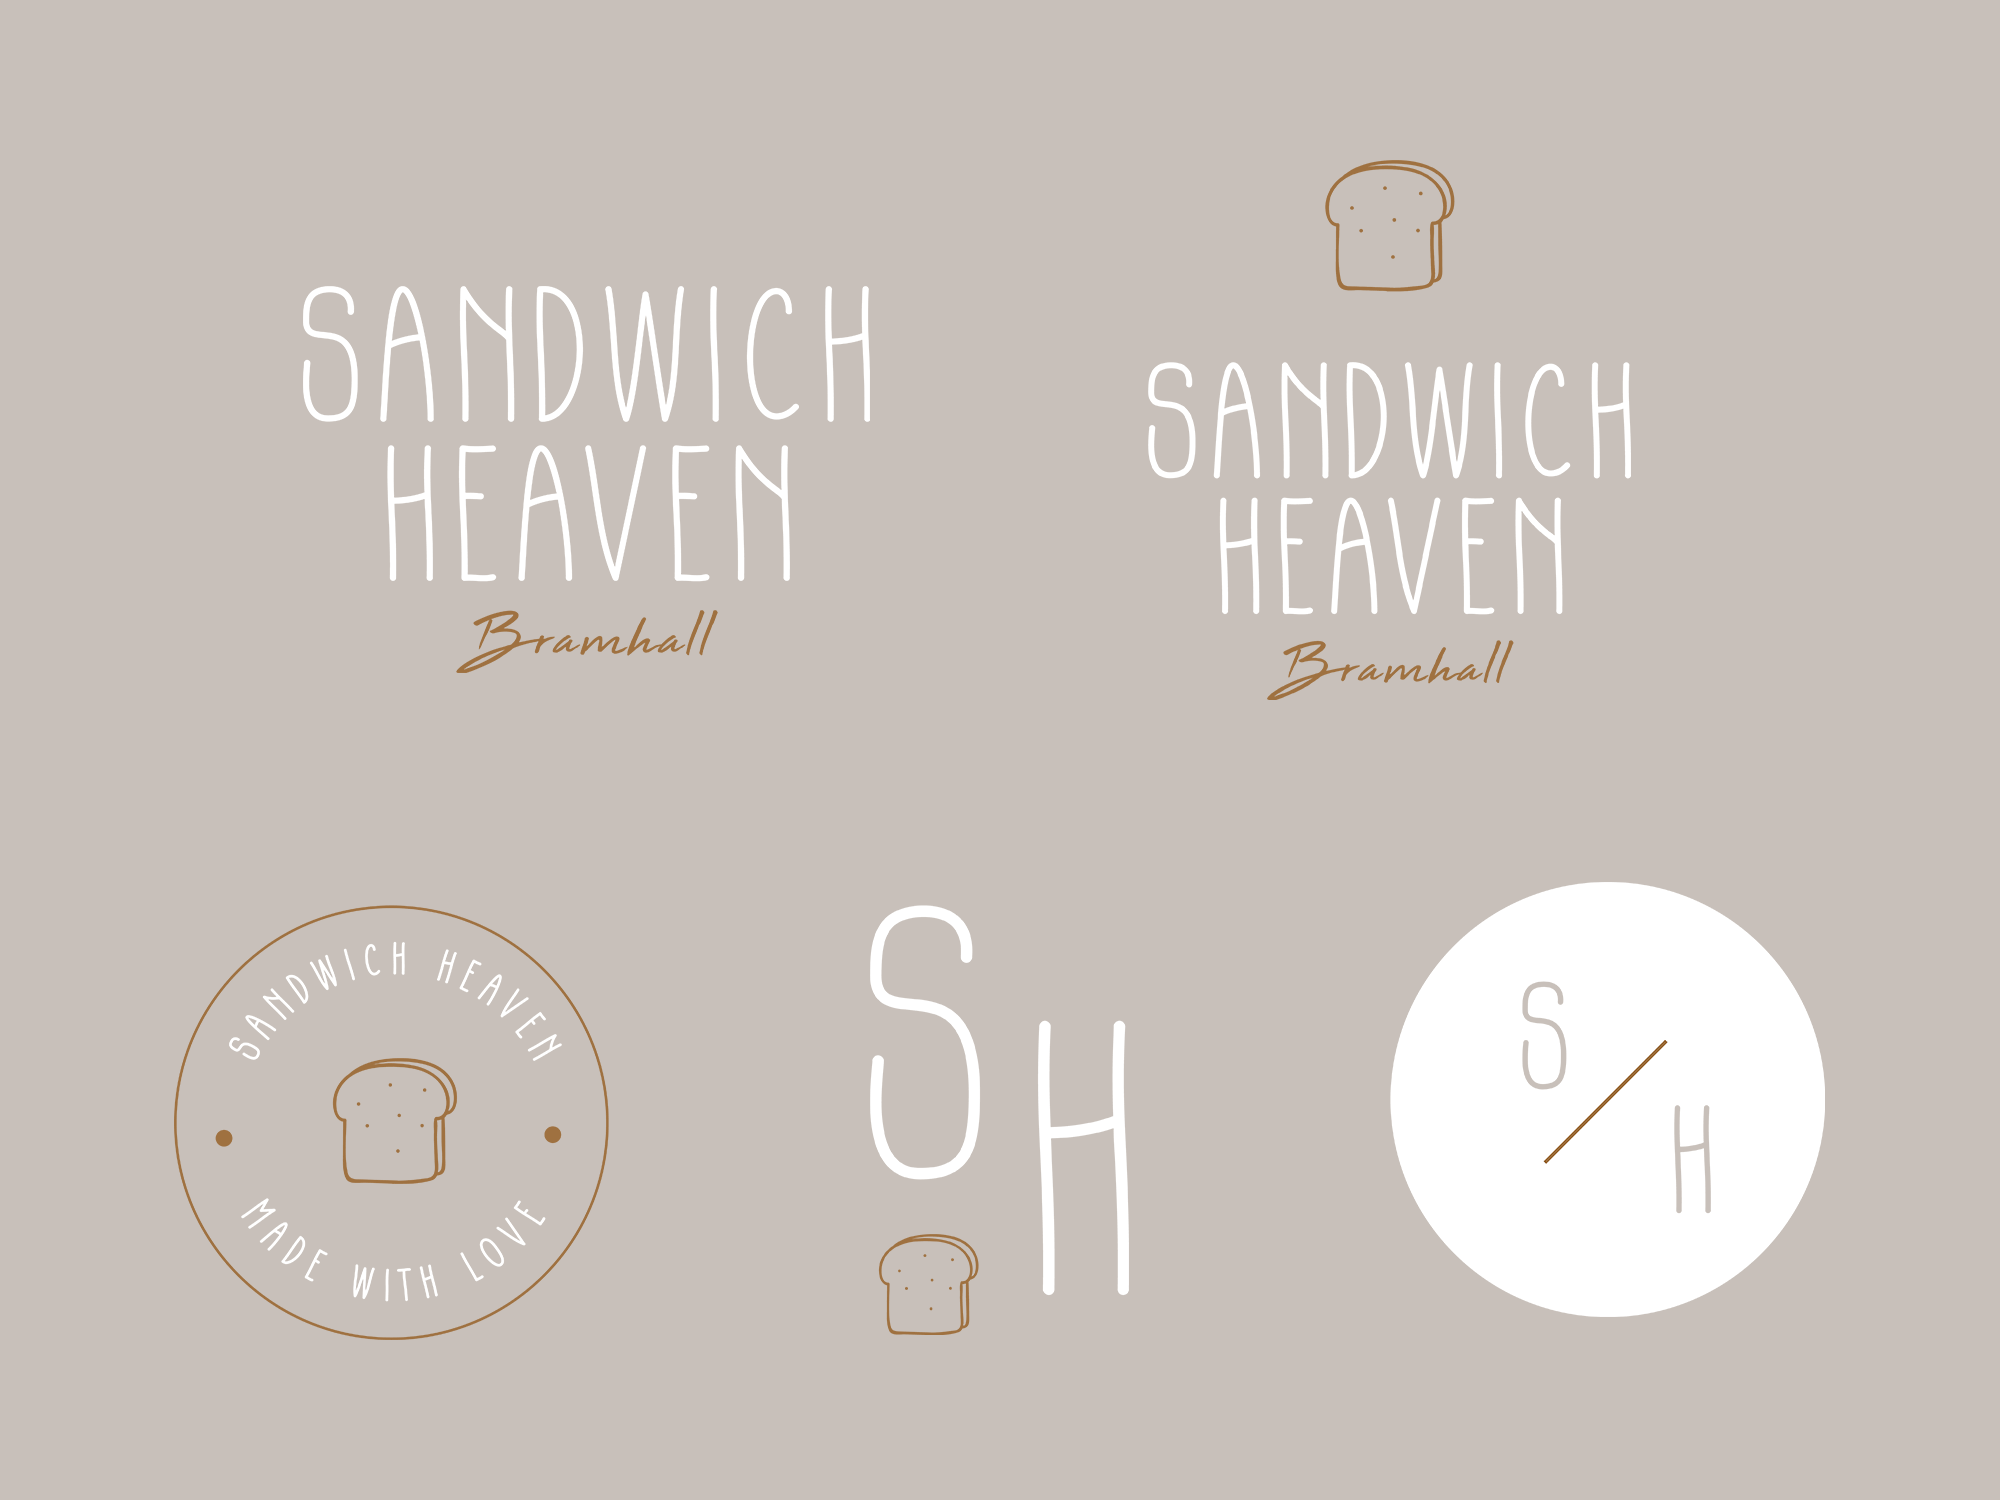 logo-variations-branding-manchester.png